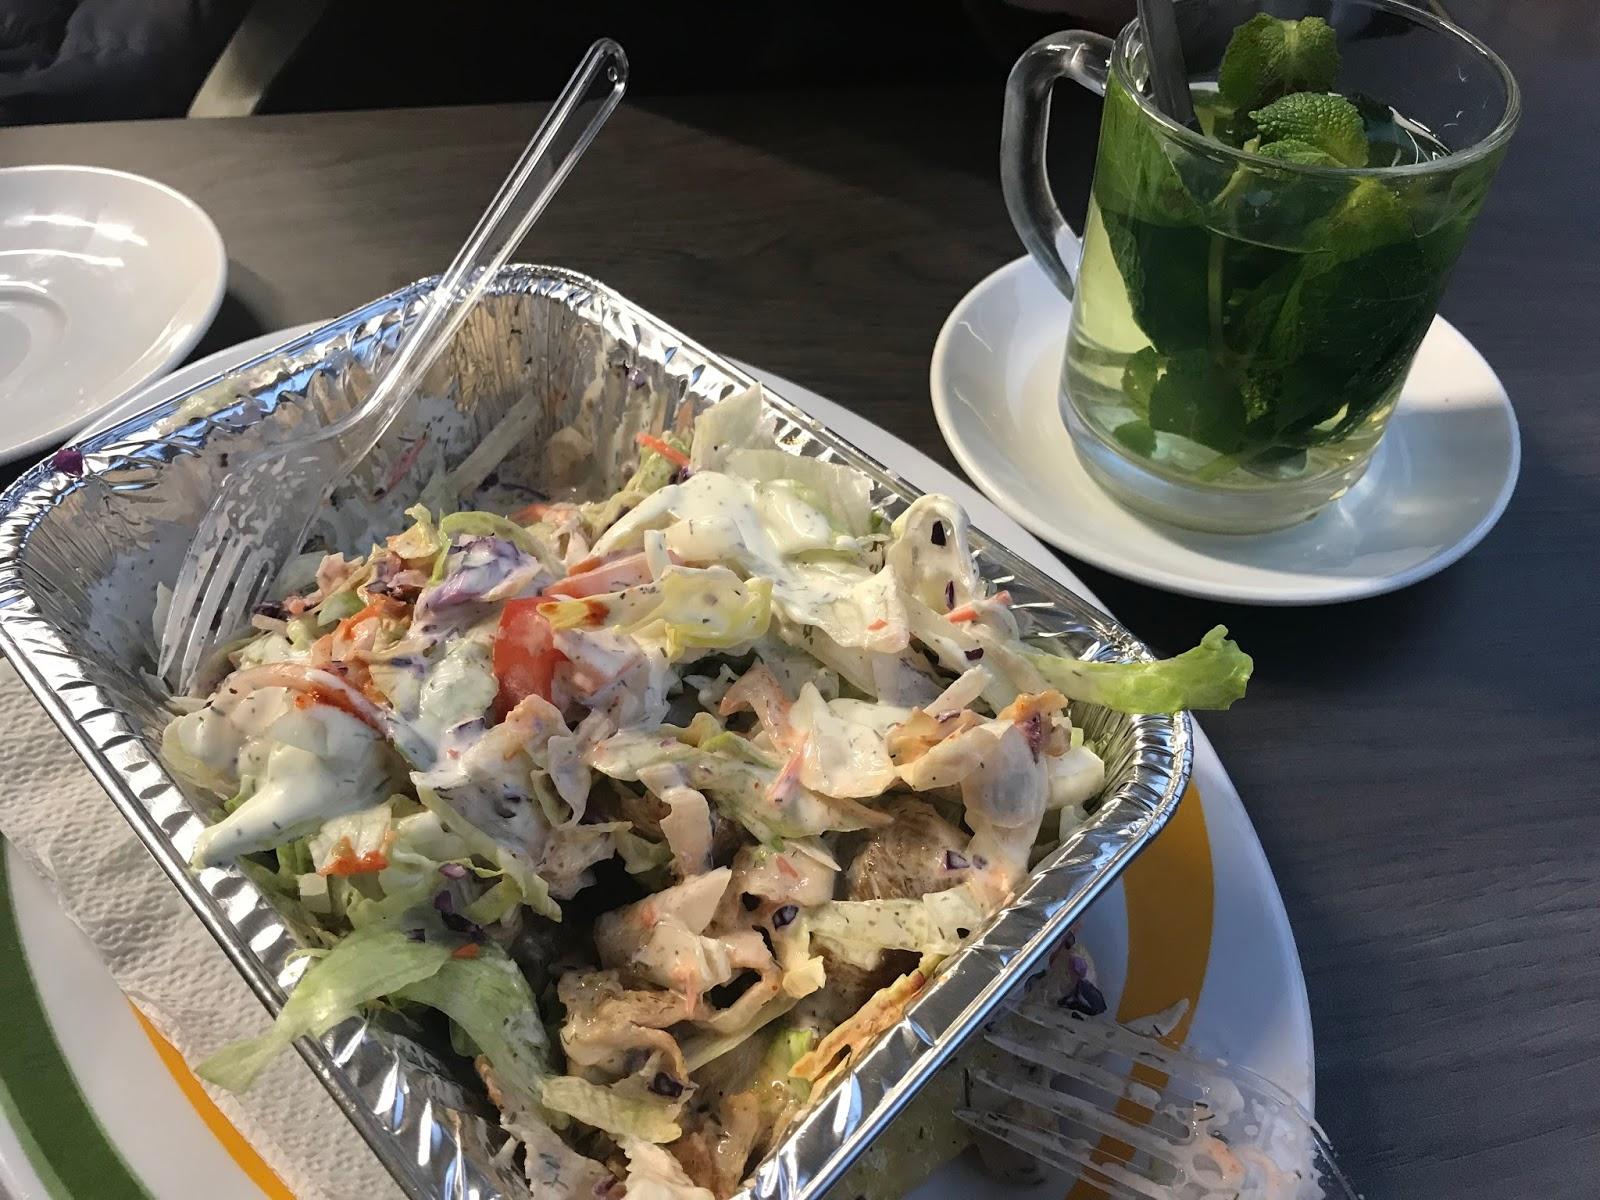 Trik Tetap Kenyang saat Jalani Diet Keto